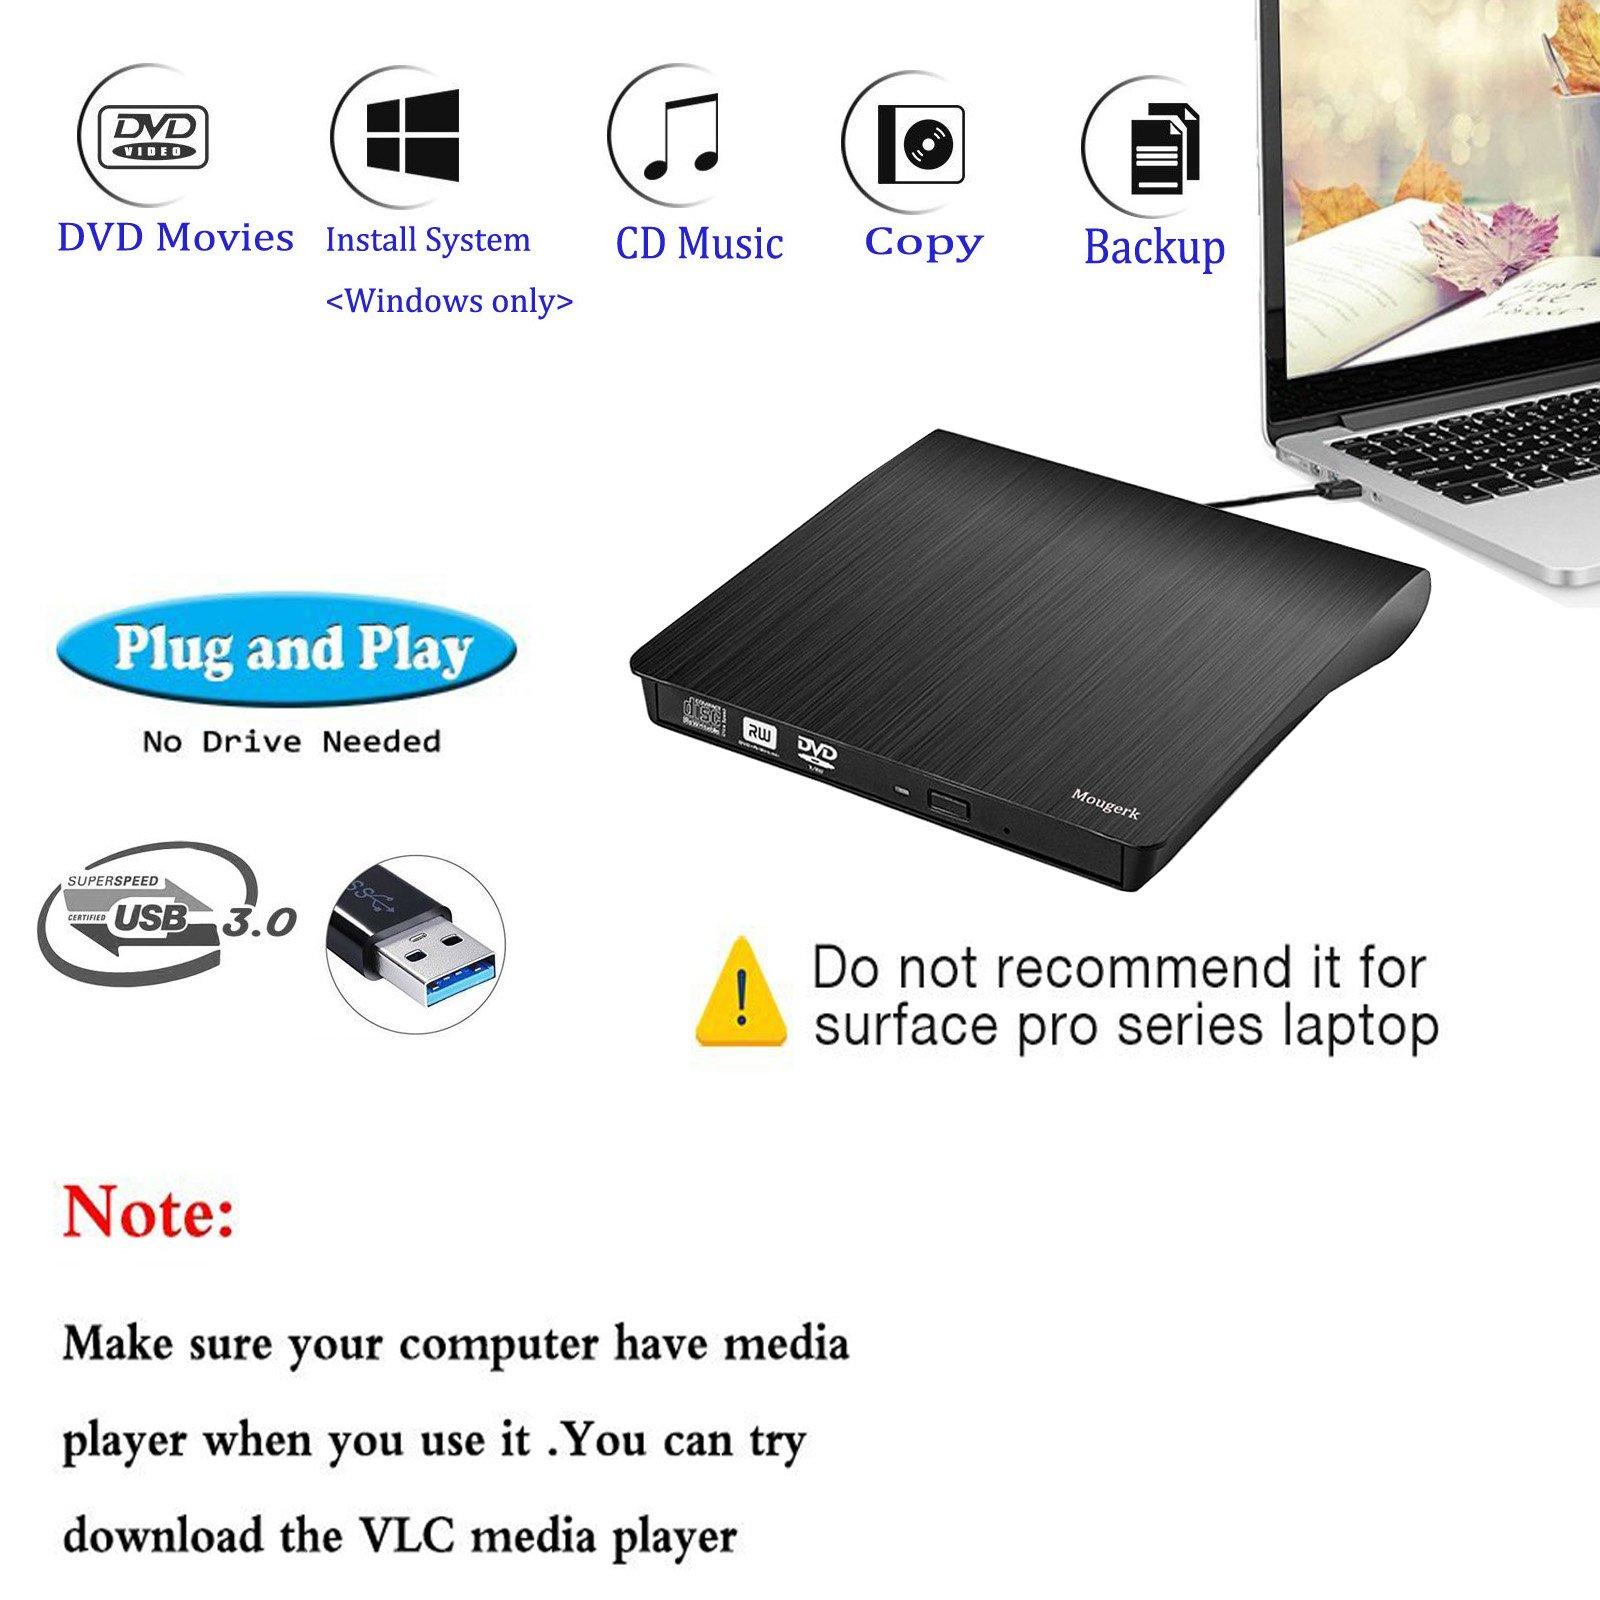 External DVD CD Drive, Mougerk USB 3.0 Ultra Slim Drives CD DVD RW Player/ DVD CD ROM Drive / Writer / Rewriter / USB CD Burner For Mac Macbook Pro, Laptops Desktops by Mougerk (Image #2)